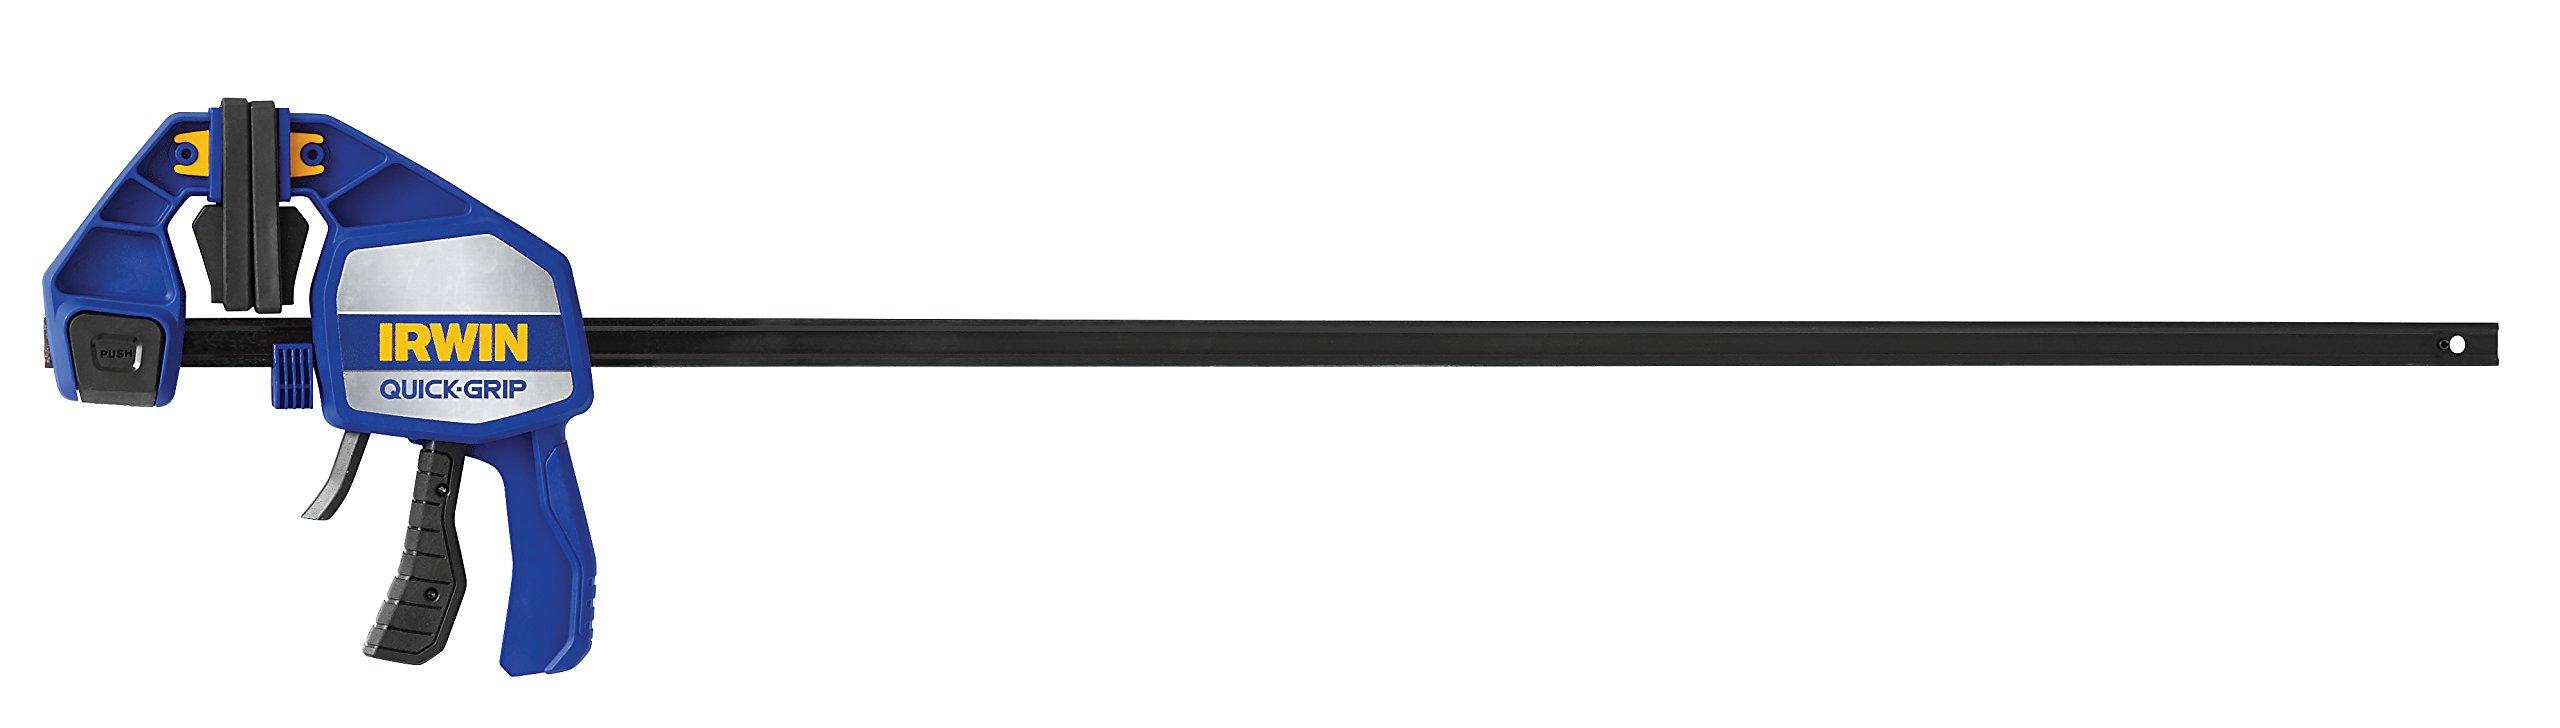 IRWINQUICK-GRIPOne-Handed Bar Clamp, Heavy-Duty, 36'', 1964715